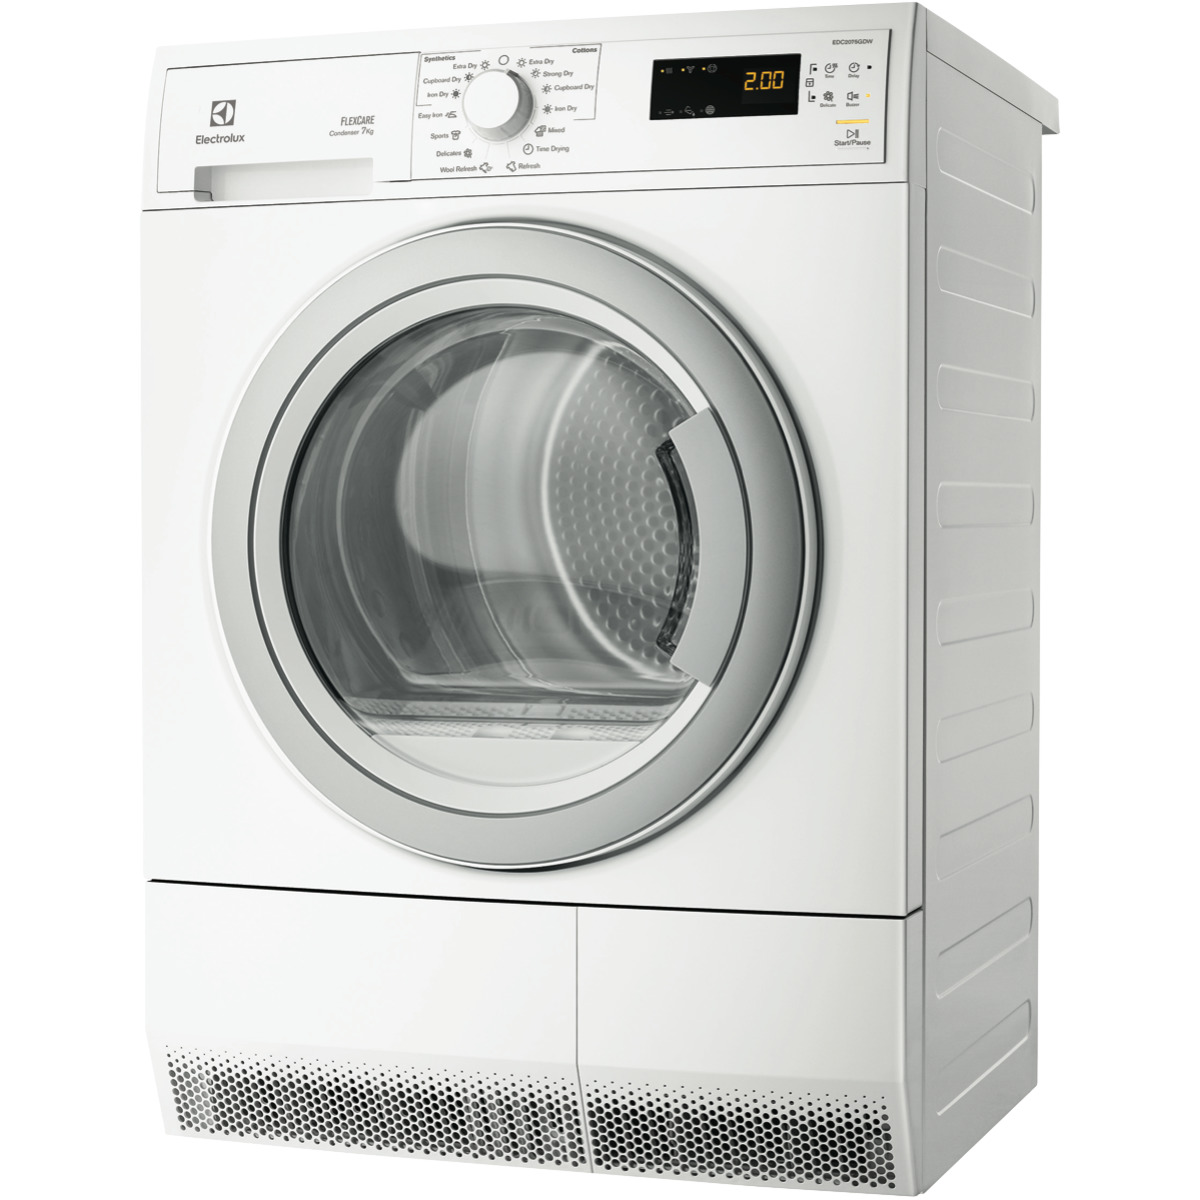 Washer Dryer Repair In Houston Tx, Dryer Machine And Drum